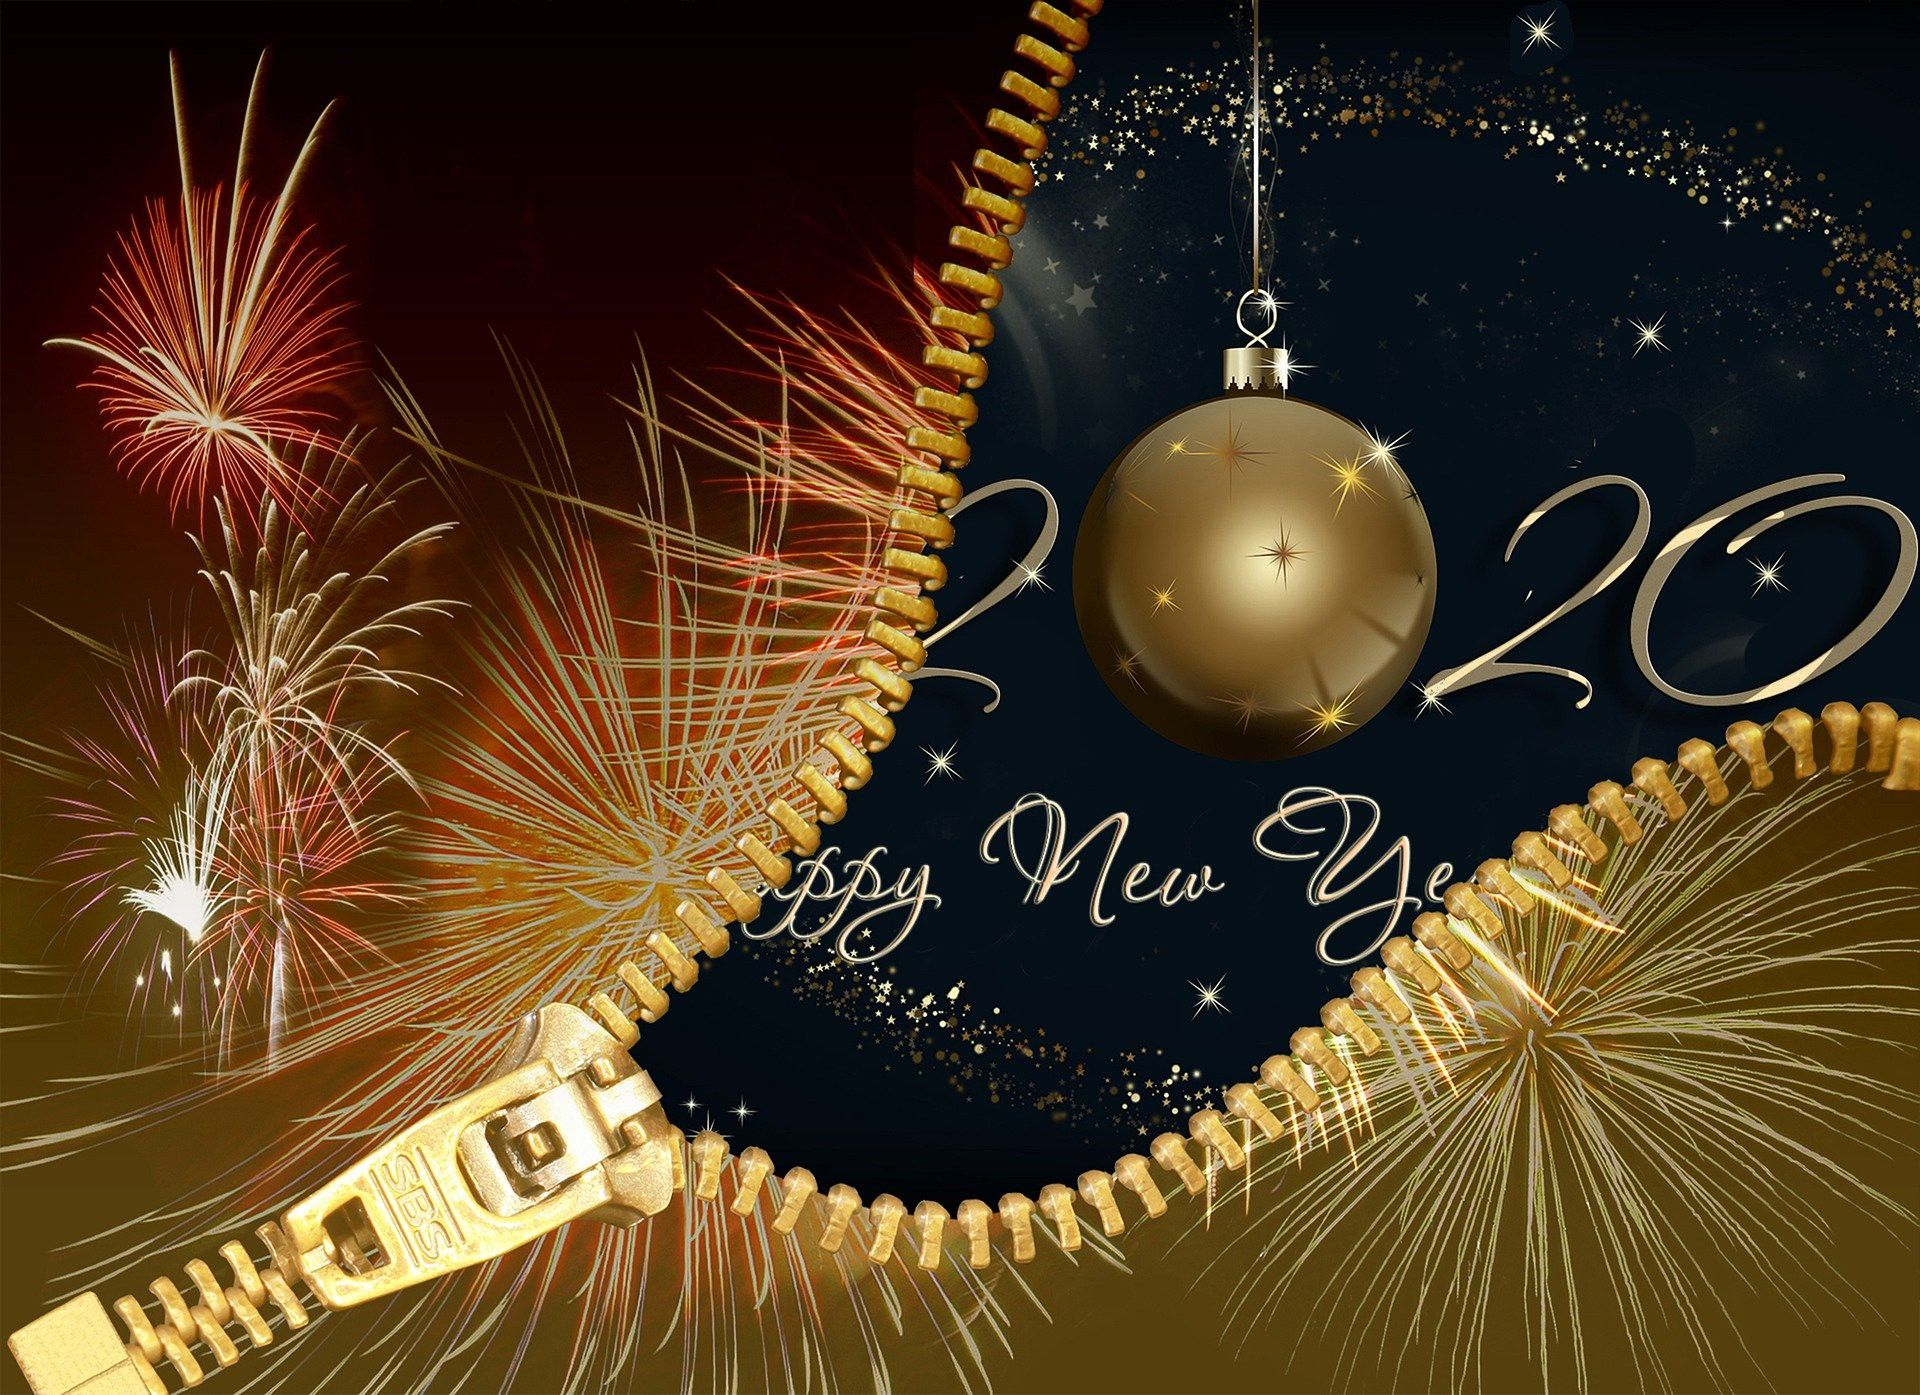 Happy New Year 2020 Happy New Year Download Happy New Year 2020 Happy New Year Gif